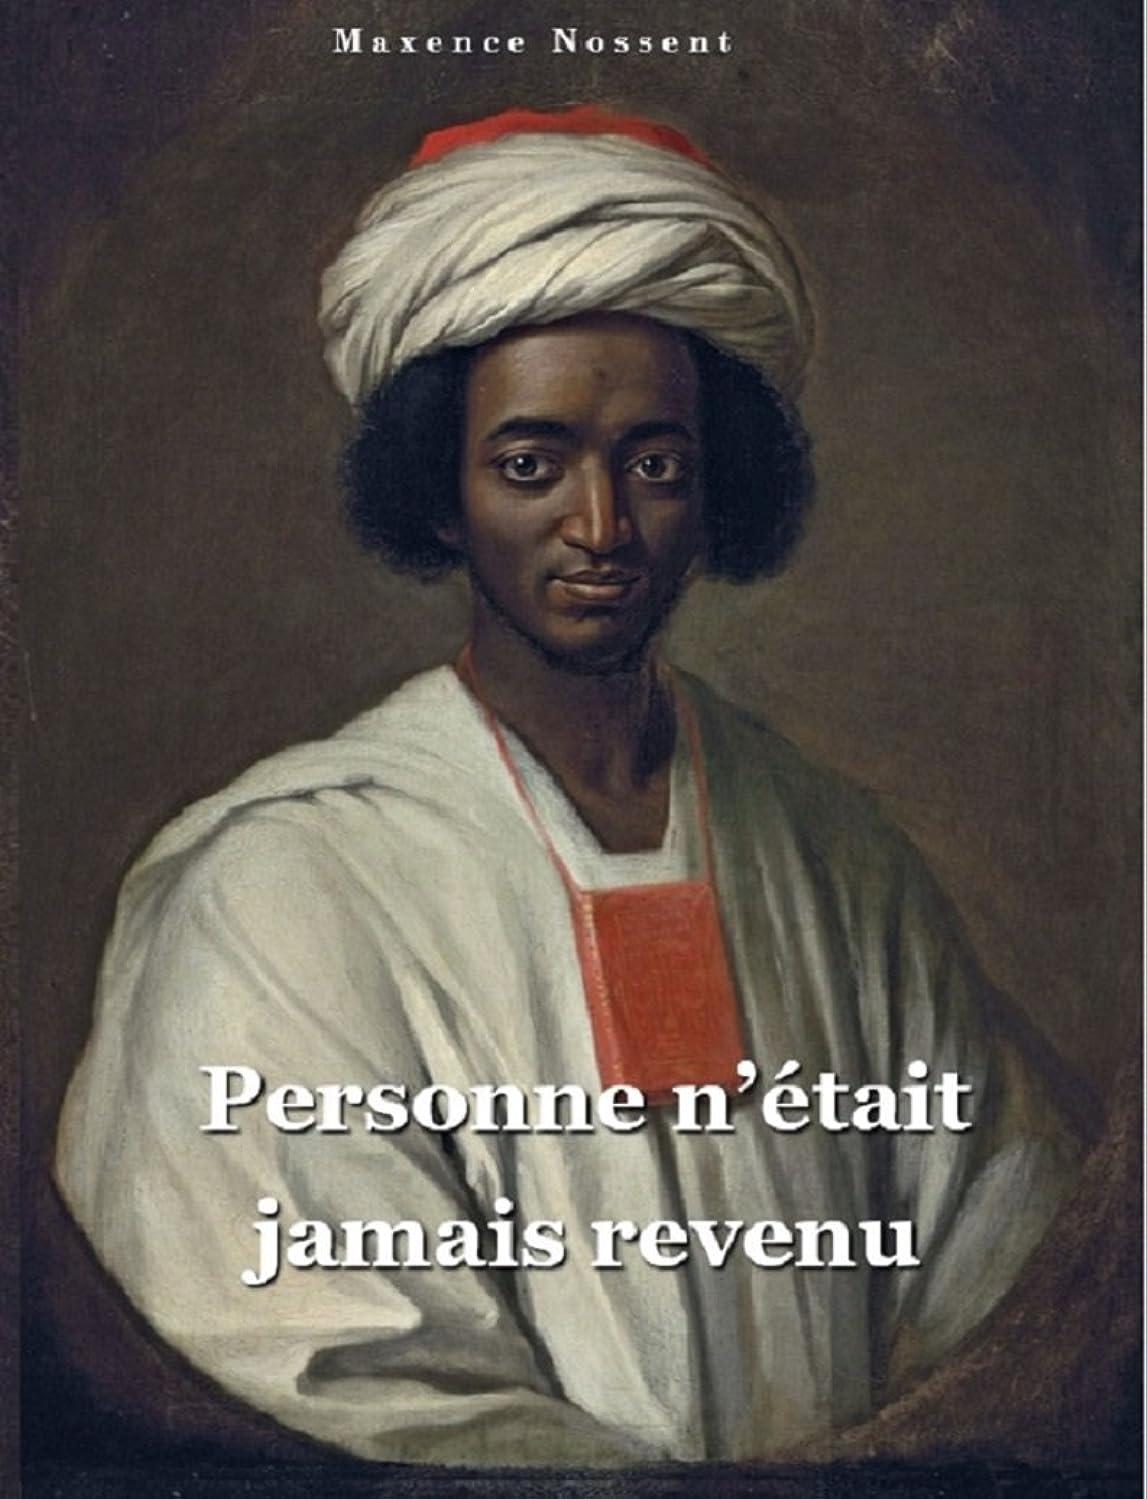 櫛主権者制限するPersonne n'était jamais revenu: La vie d'Ayouba Souleyman Diallo, happé par la traite négrière (French Edition)